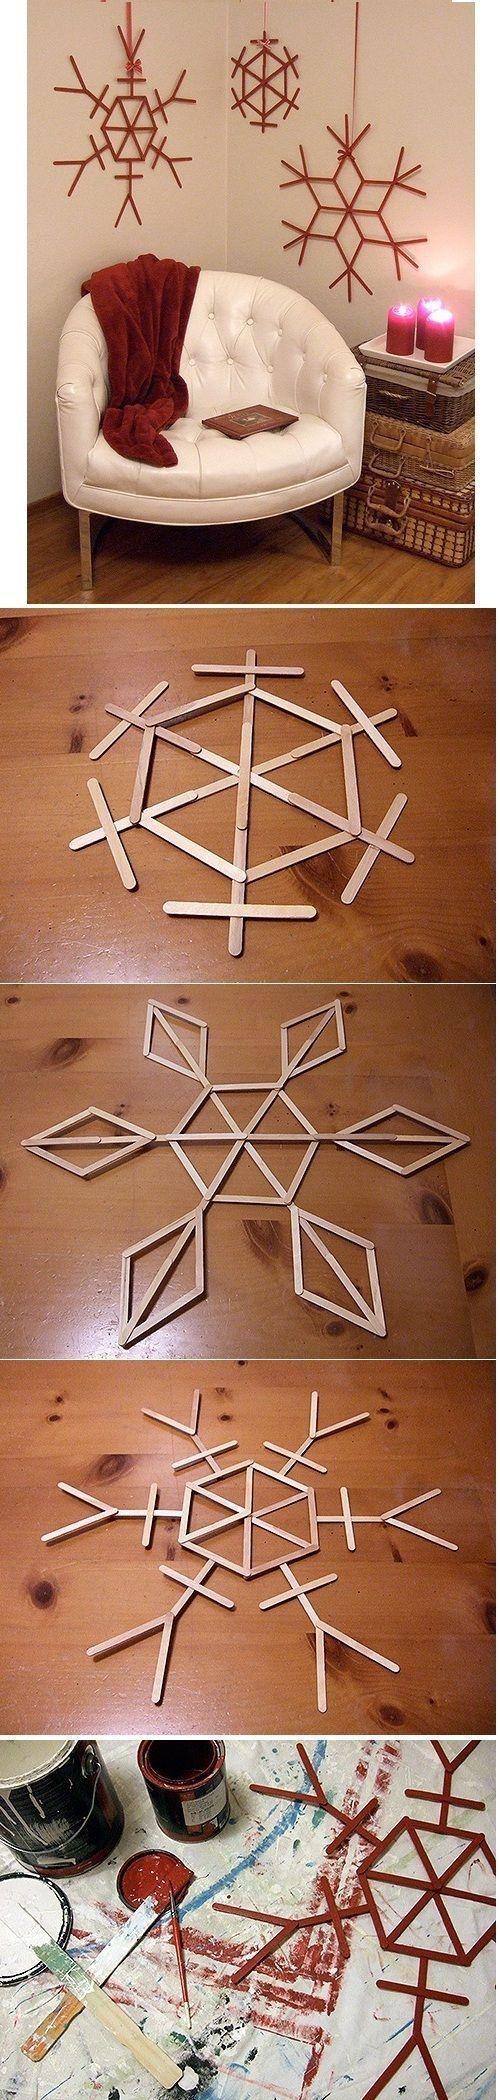 DIY Christmas Teen Crafts